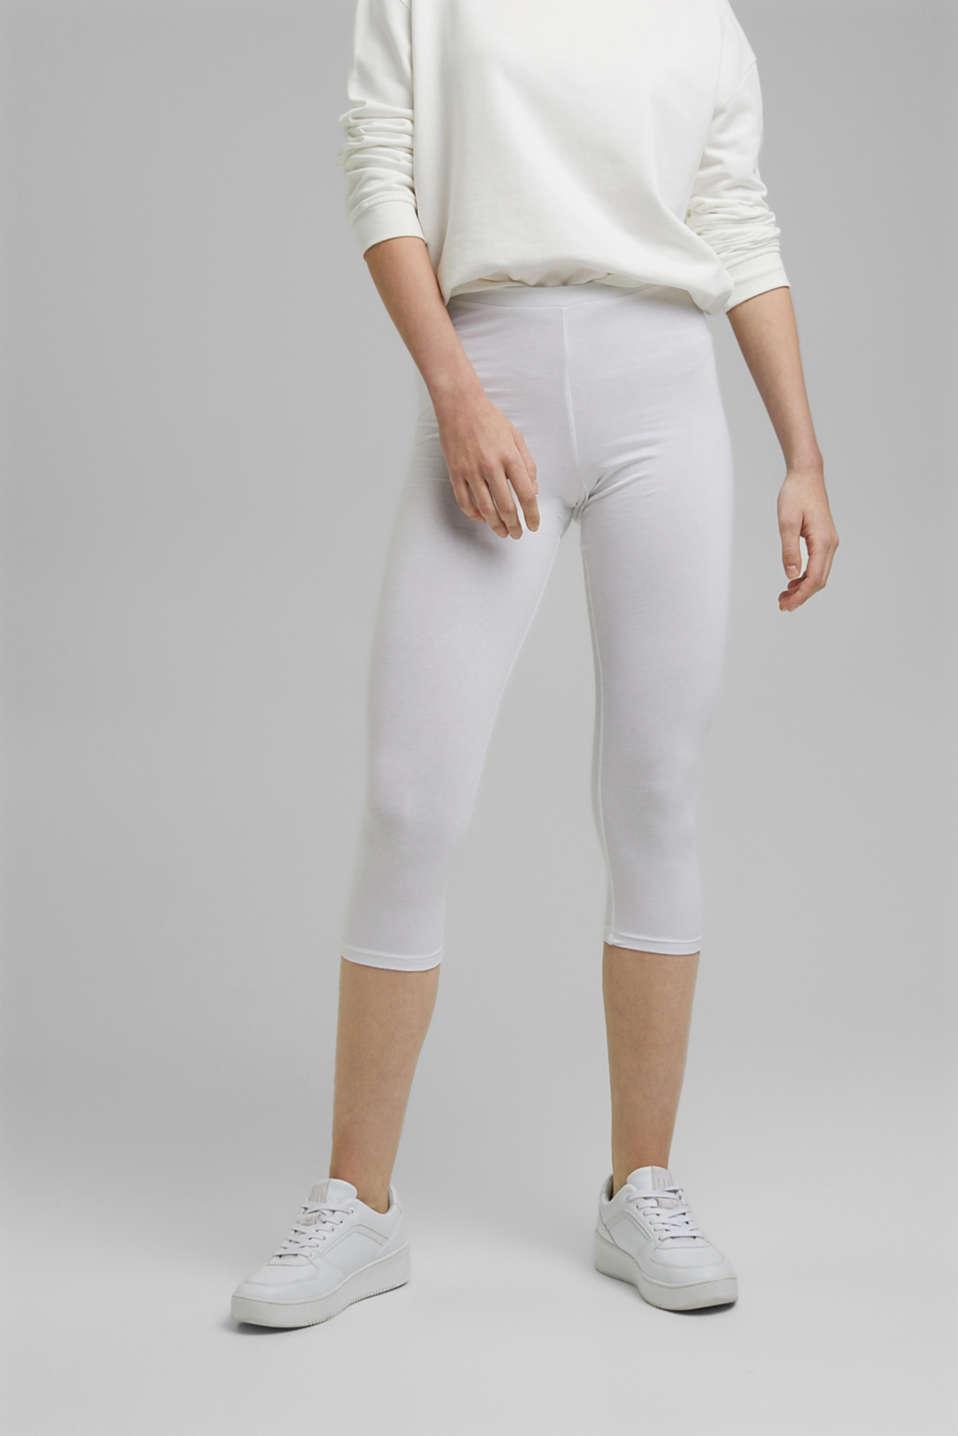 Stretch cotton Capri leggings, WHITE, detail image number 0